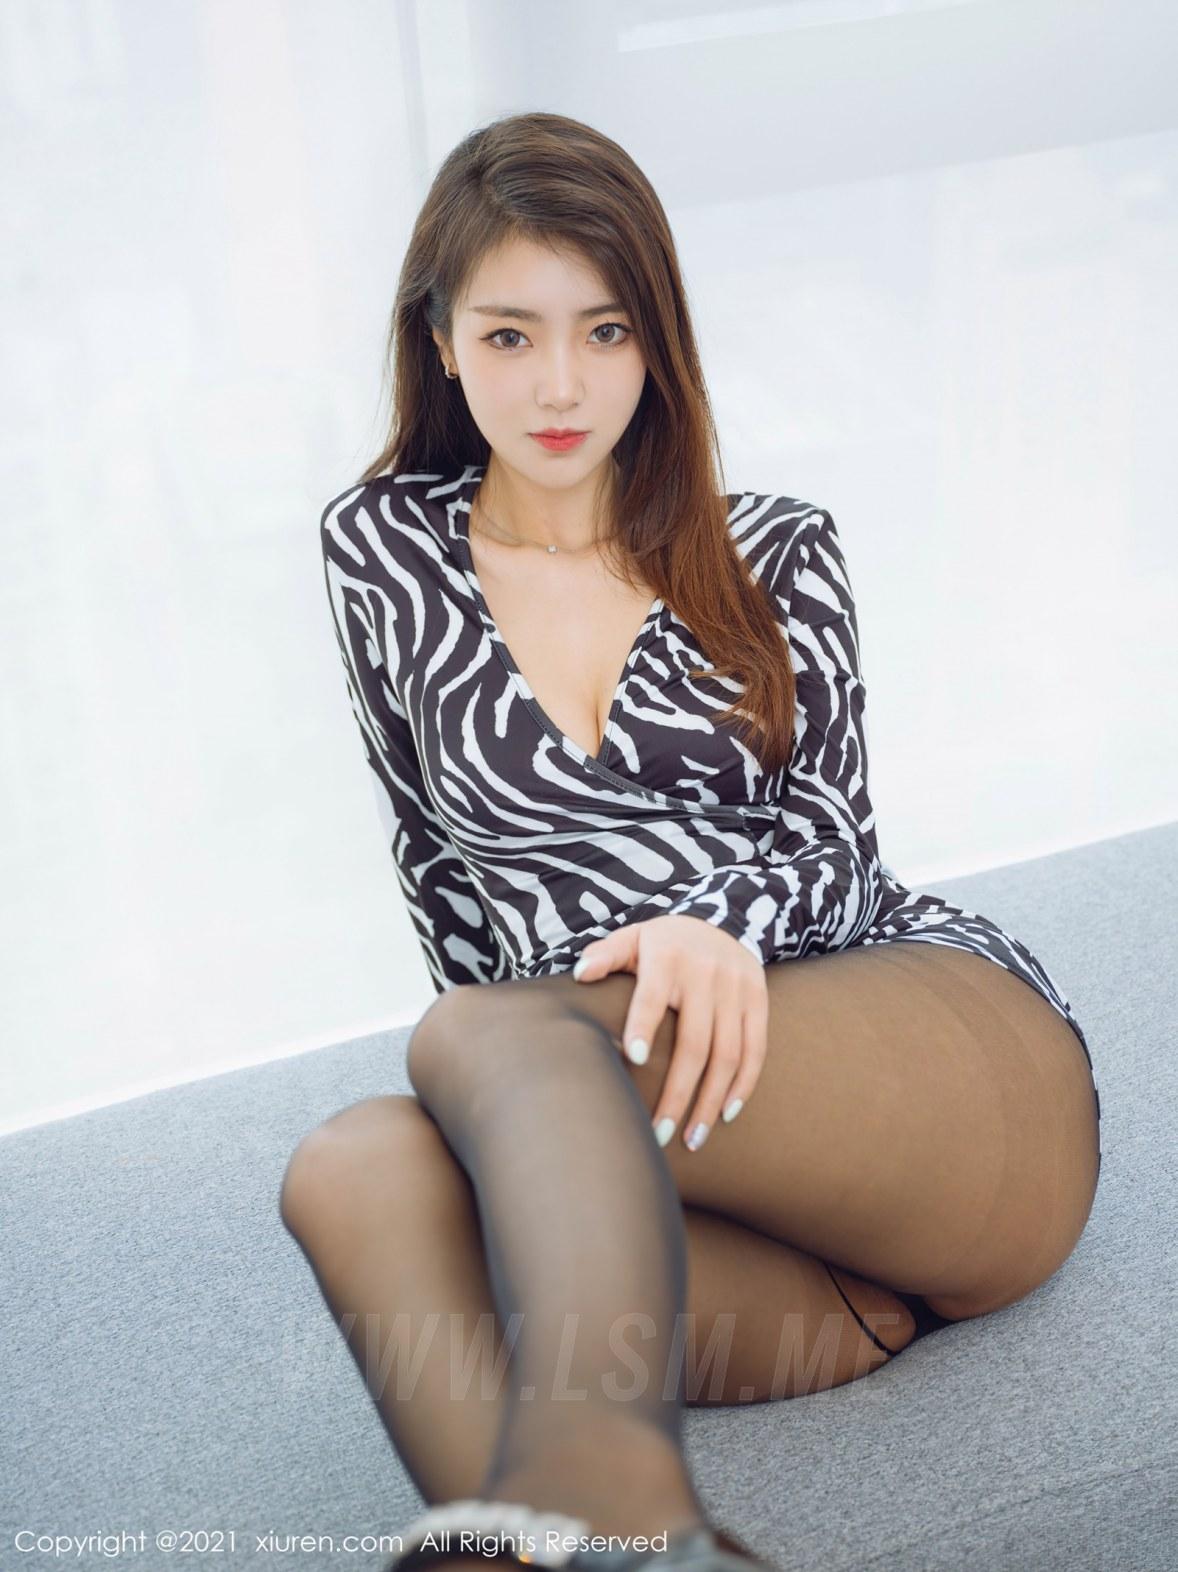 3890 029 izy 4047 5400 - XiuRen 秀人 No.3890 斑纹短裙 可樂Vicky 性感写真2 - 秀人网 -【免费在线写真】【丽人丝语】